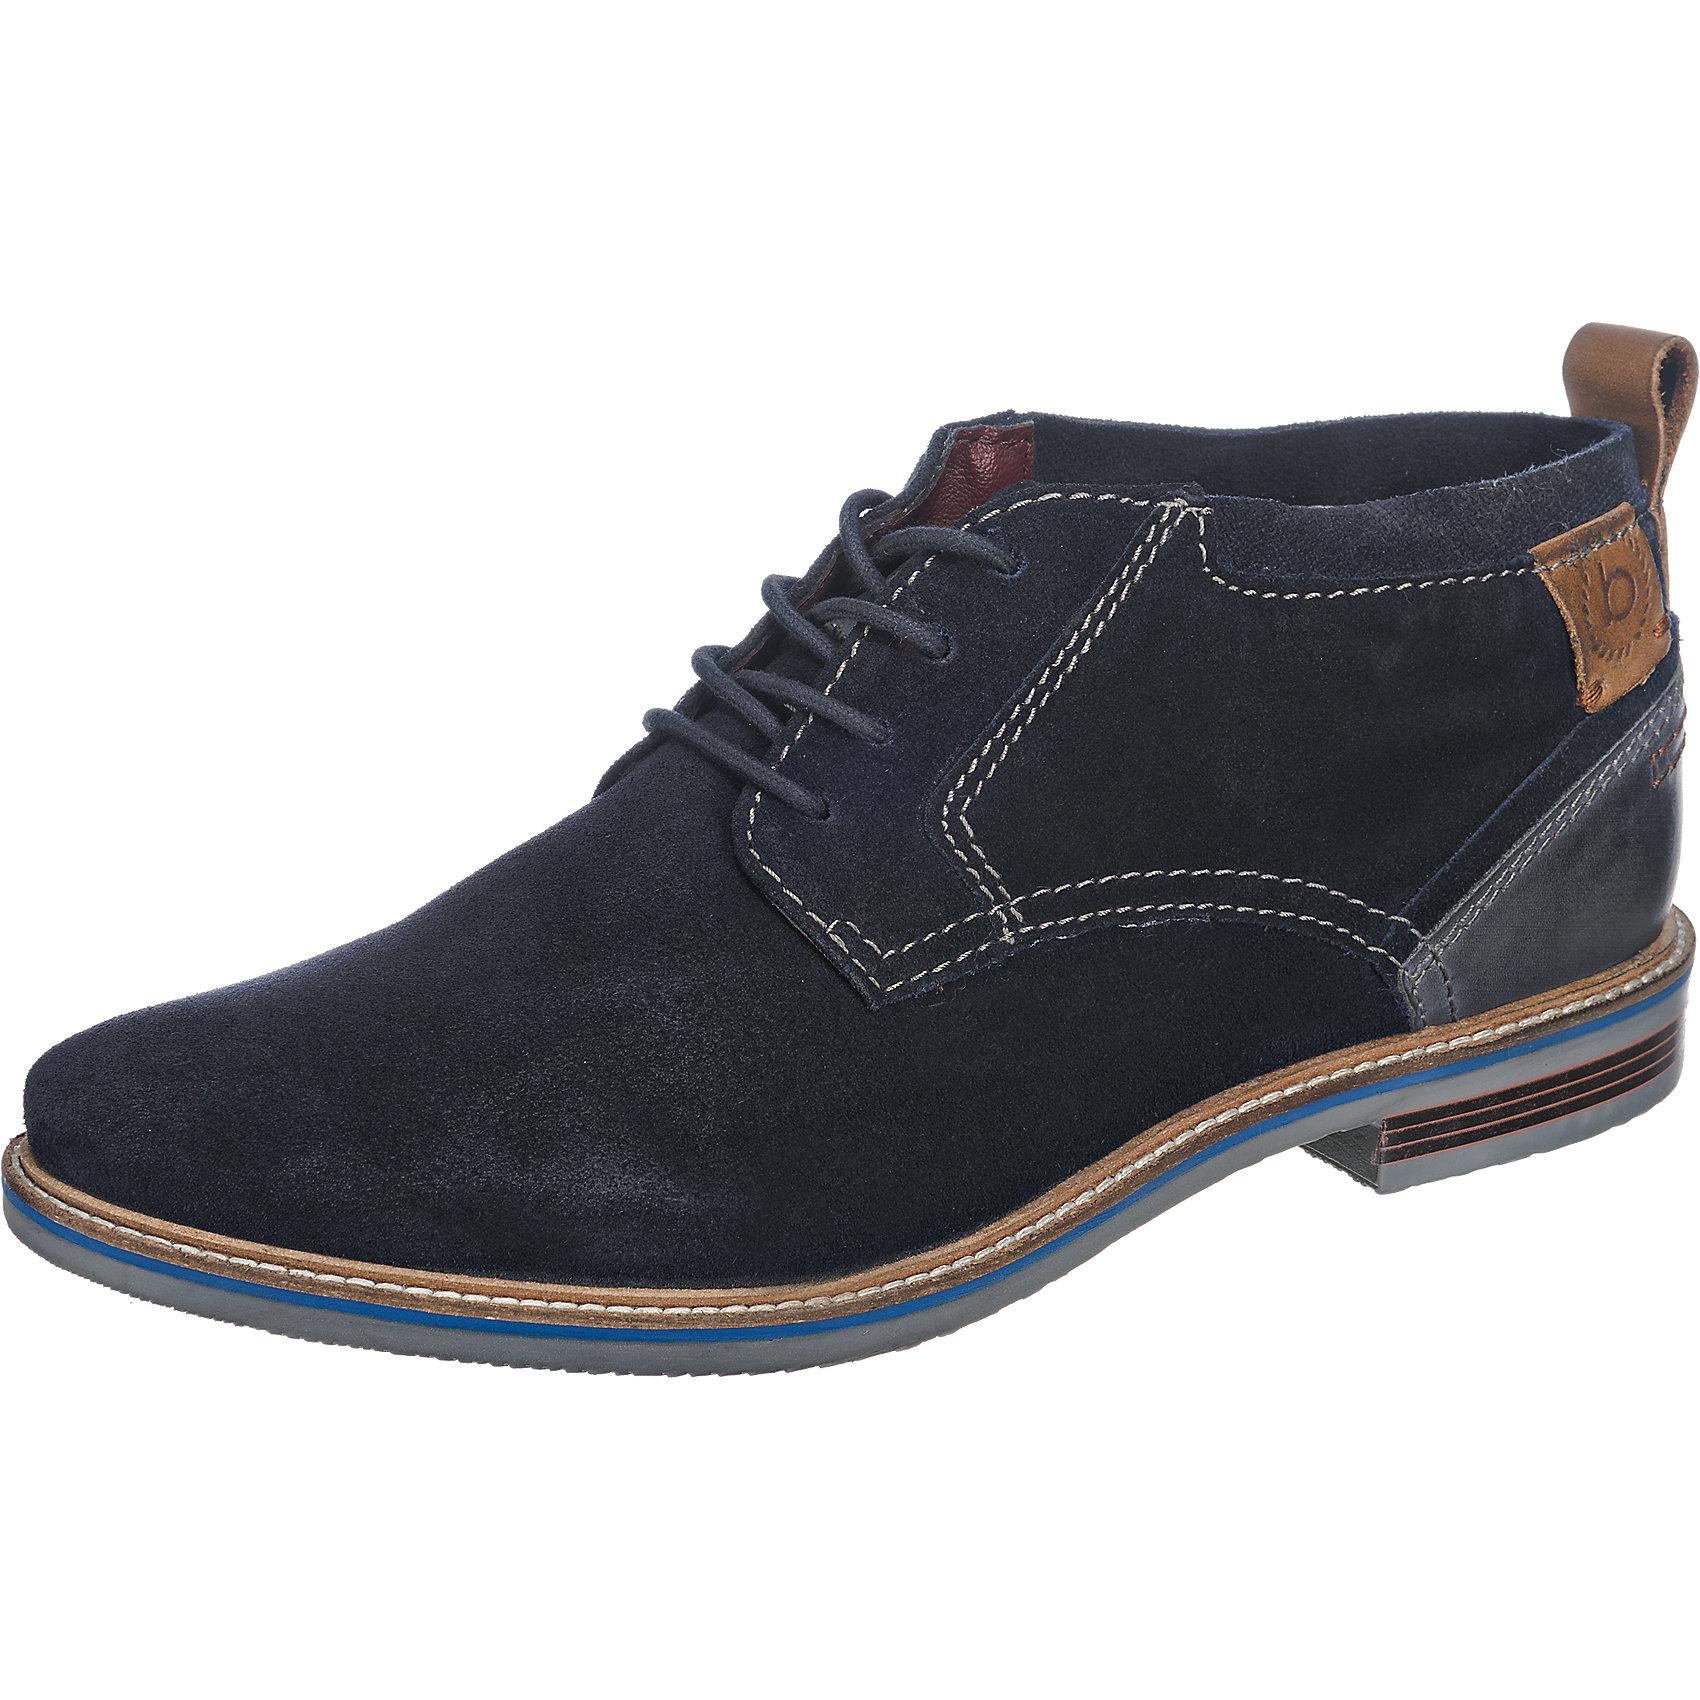 info for 491f9 18559 Details zu Neu bugatti Schuhe 5773634 für Herren dunkelgrau dunkelblau